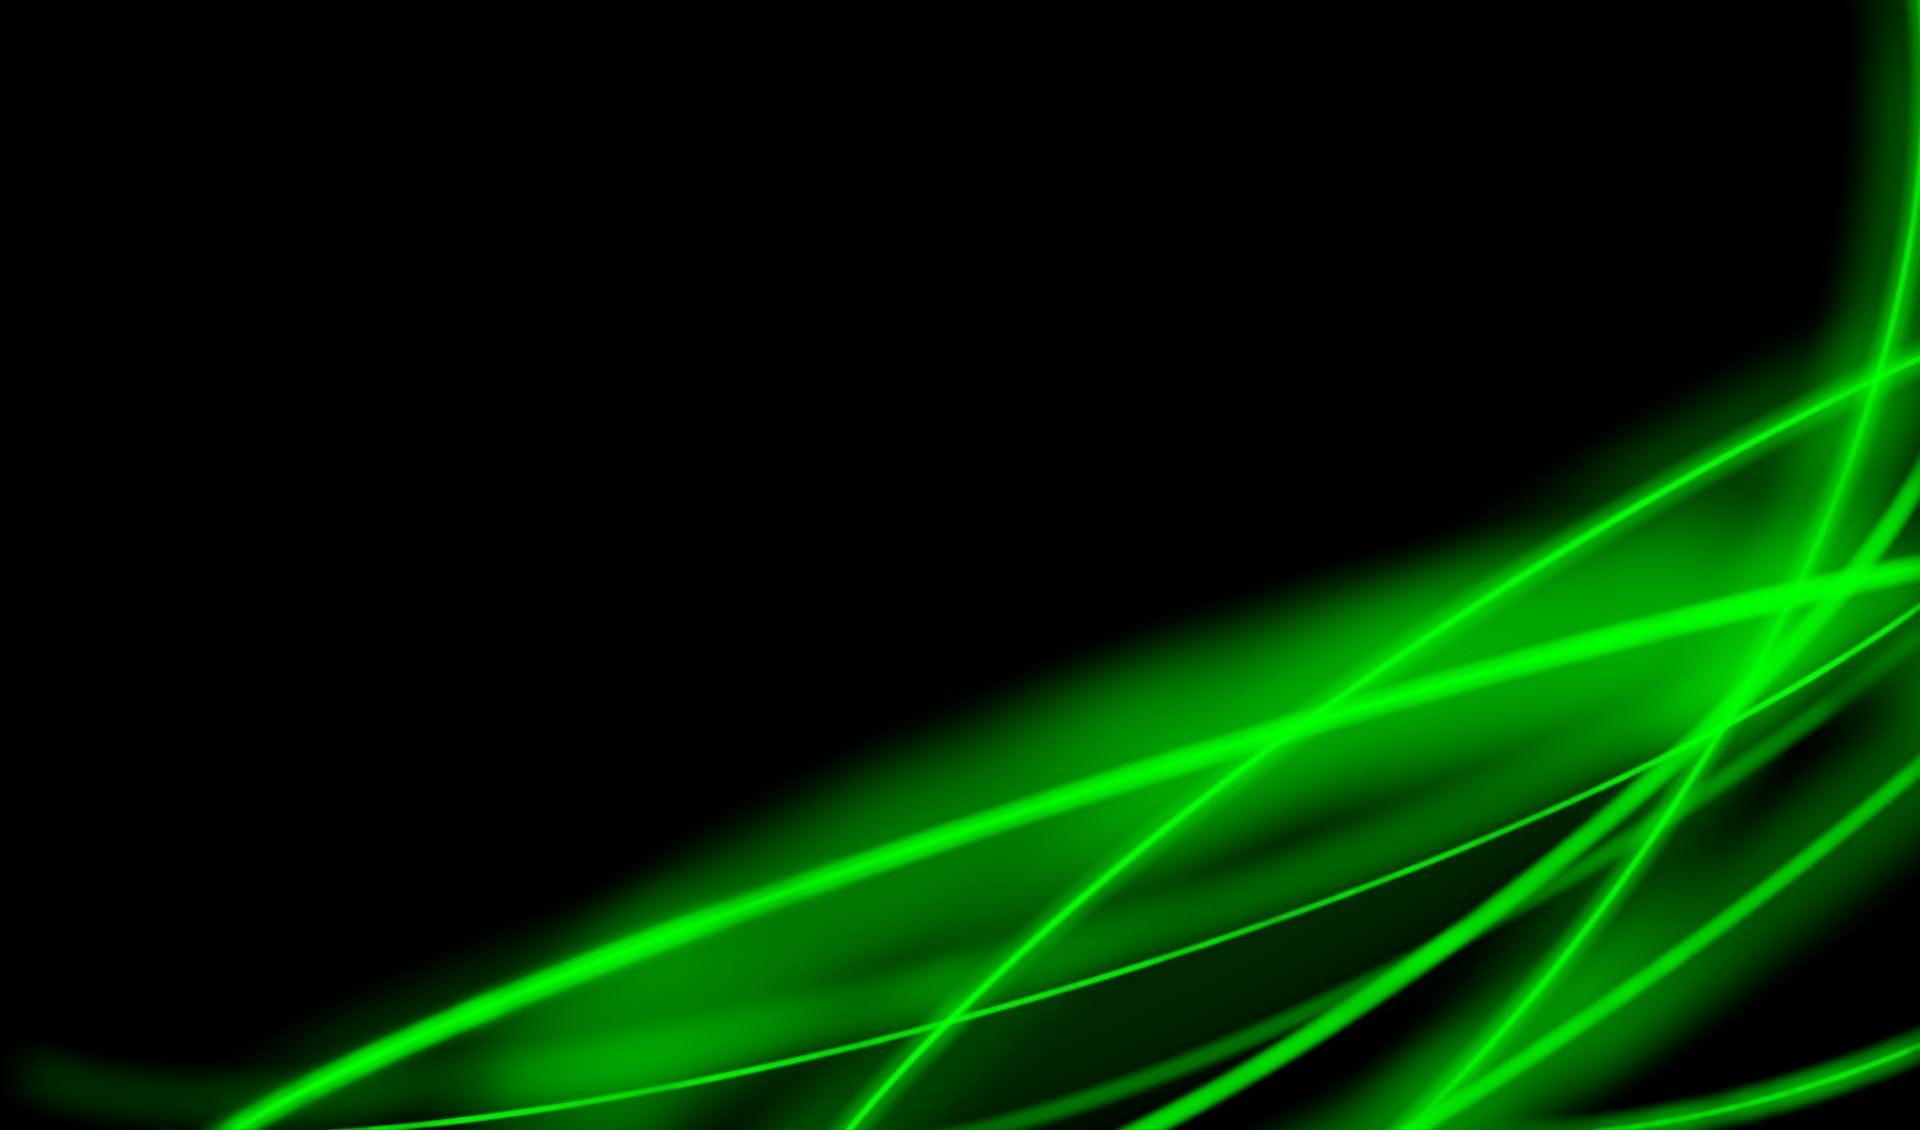 Neon Background v.1 by Dragon-Dew on DeviantArt